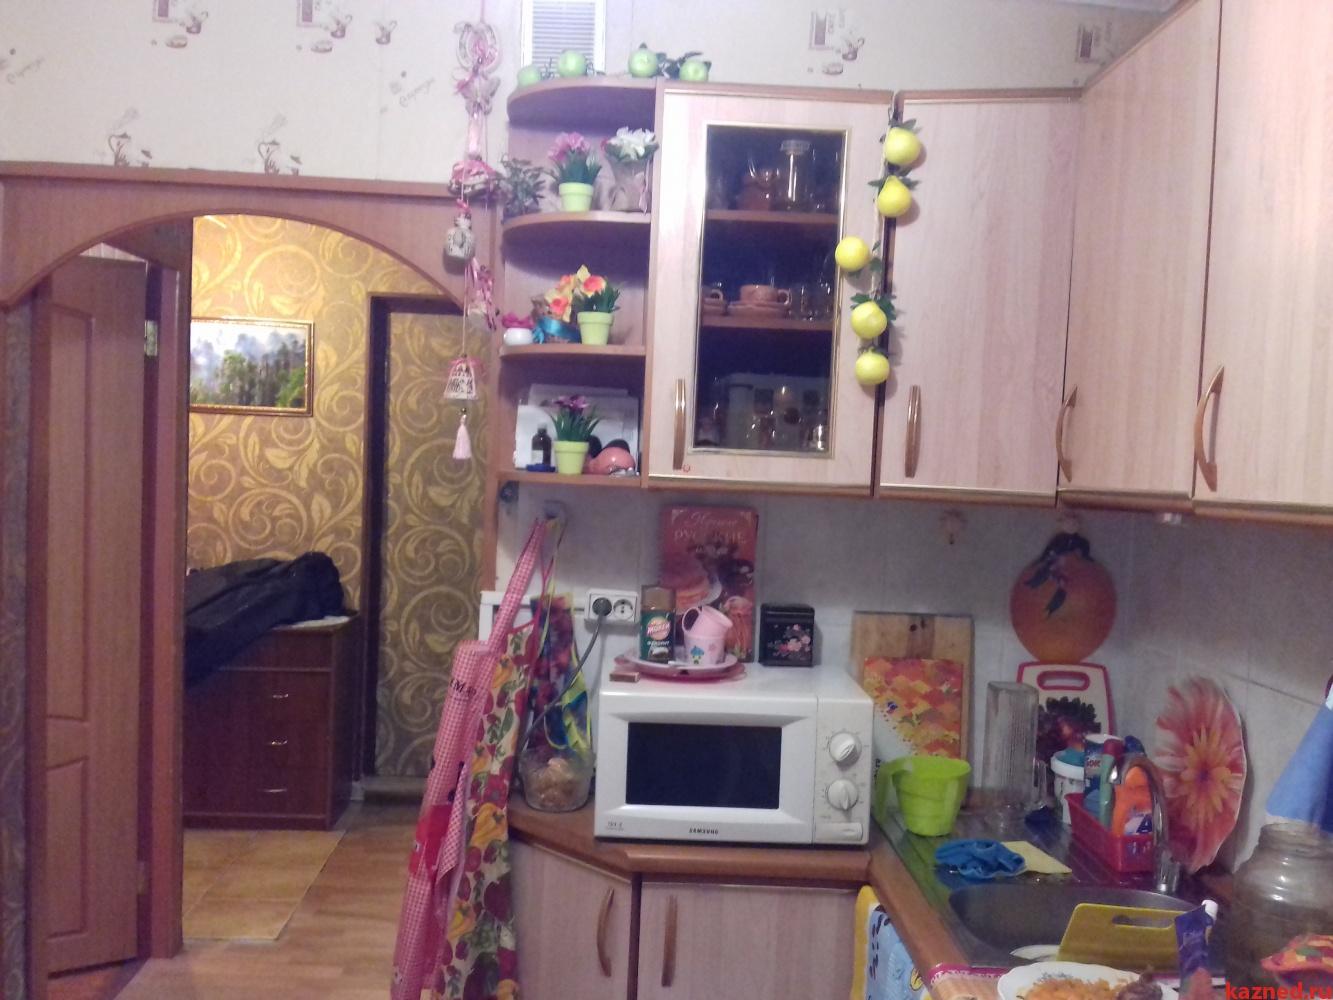 Продажа 3-к квартиры Фучика, 133, 68 м2  (миниатюра №3)